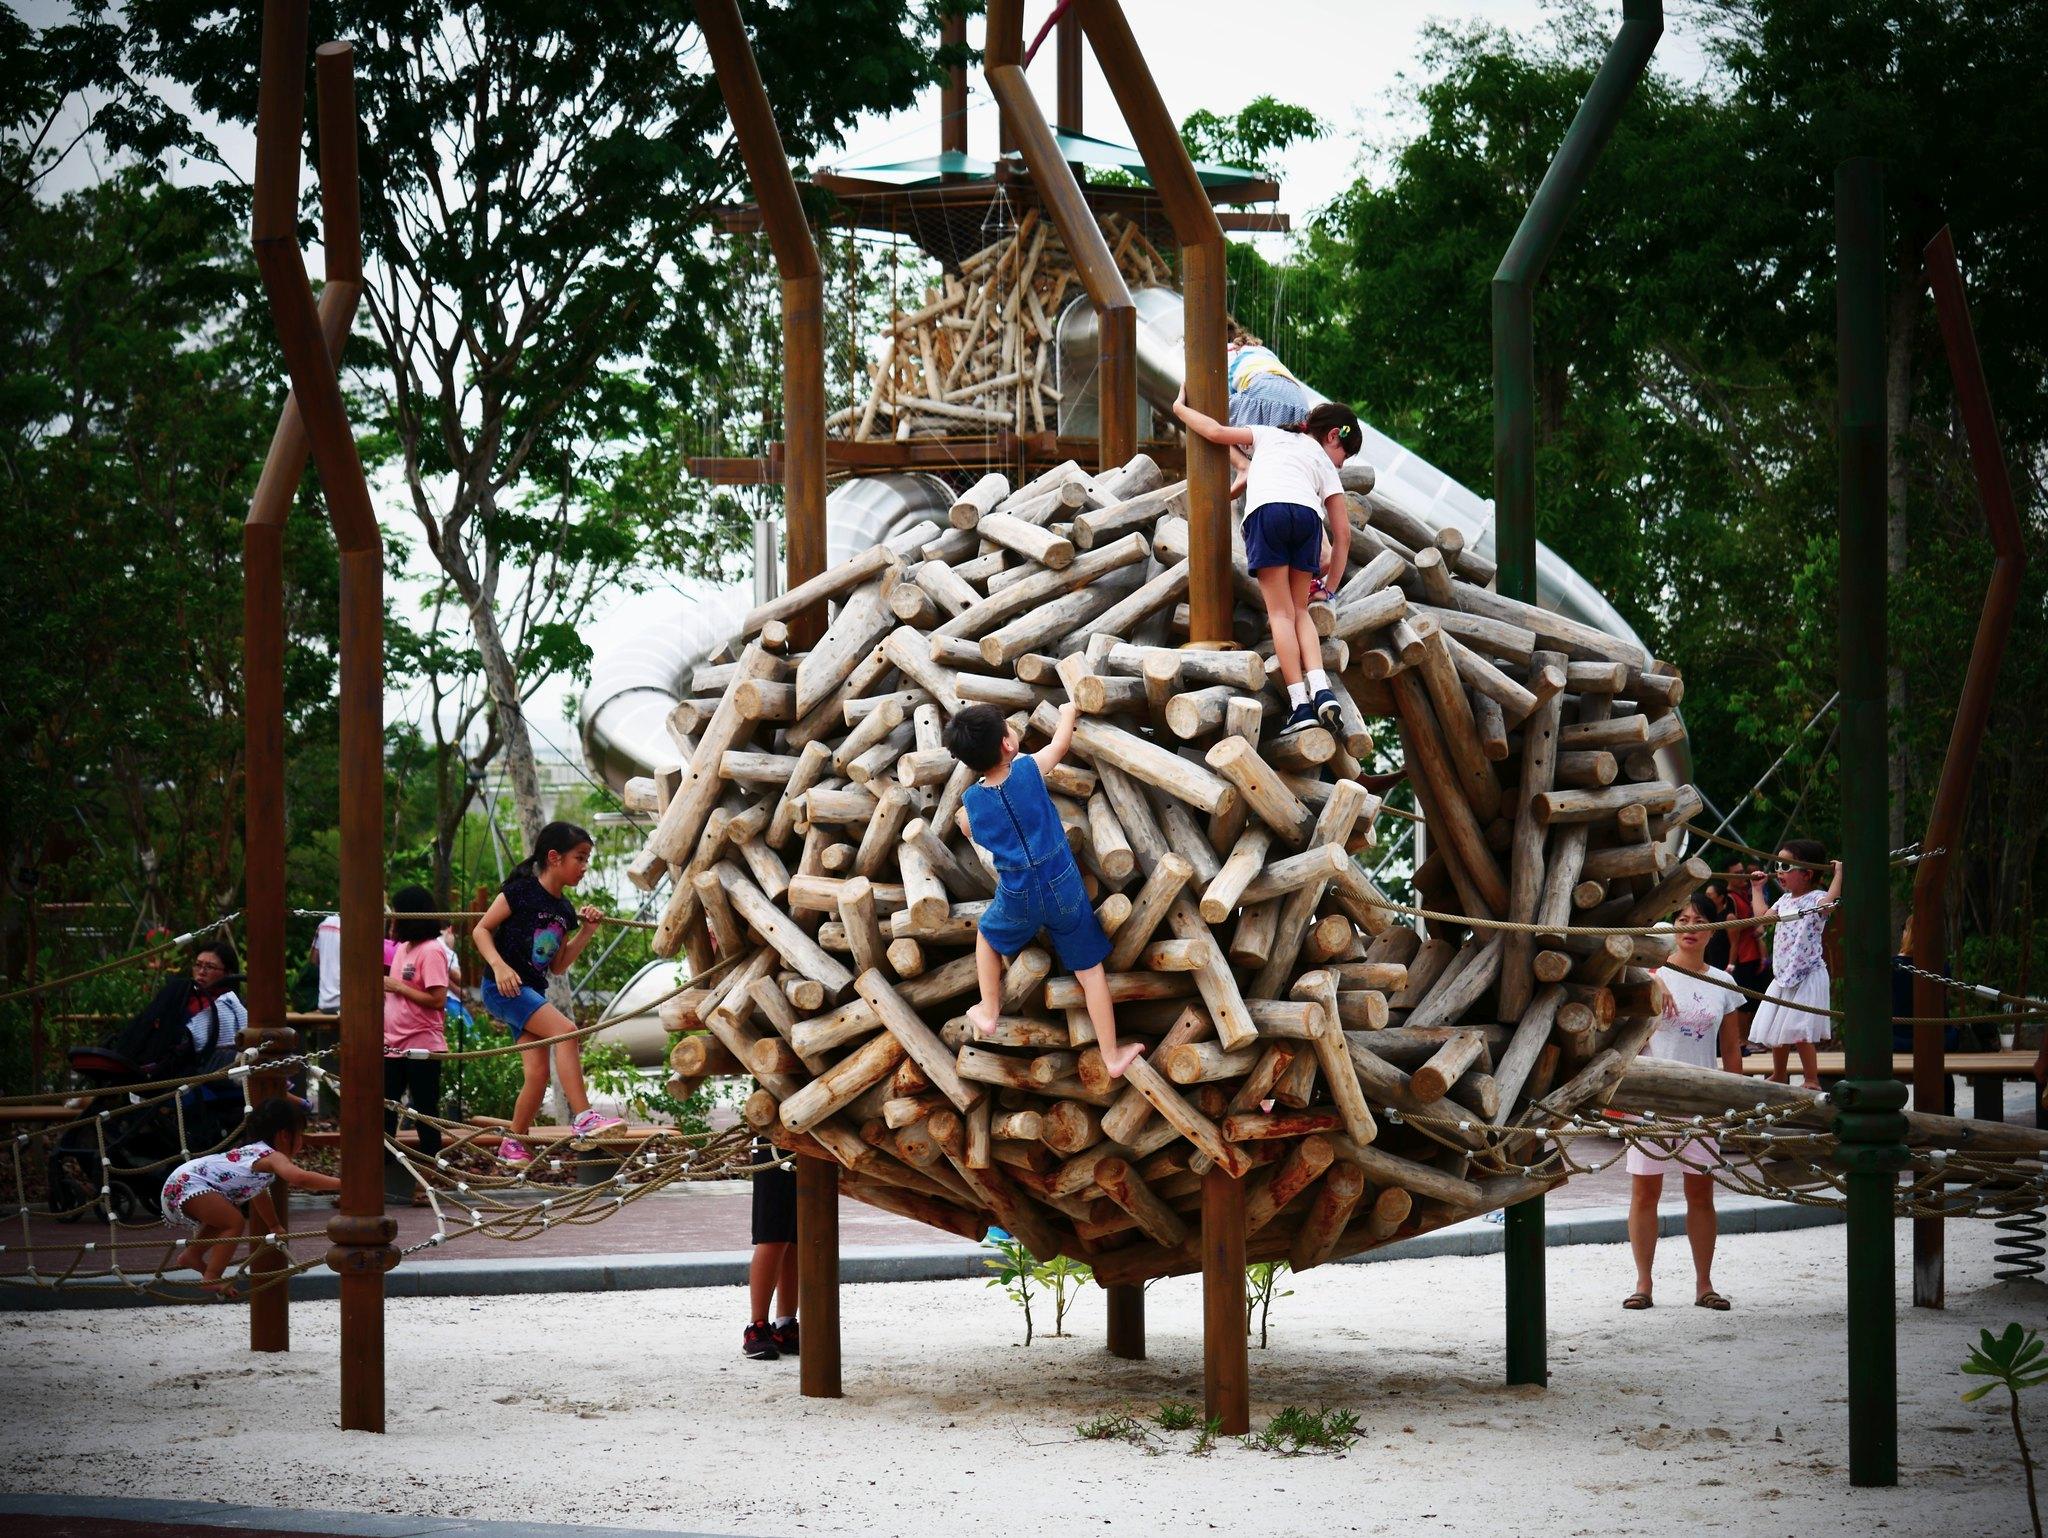 jurong lake park playground outdoor singapore